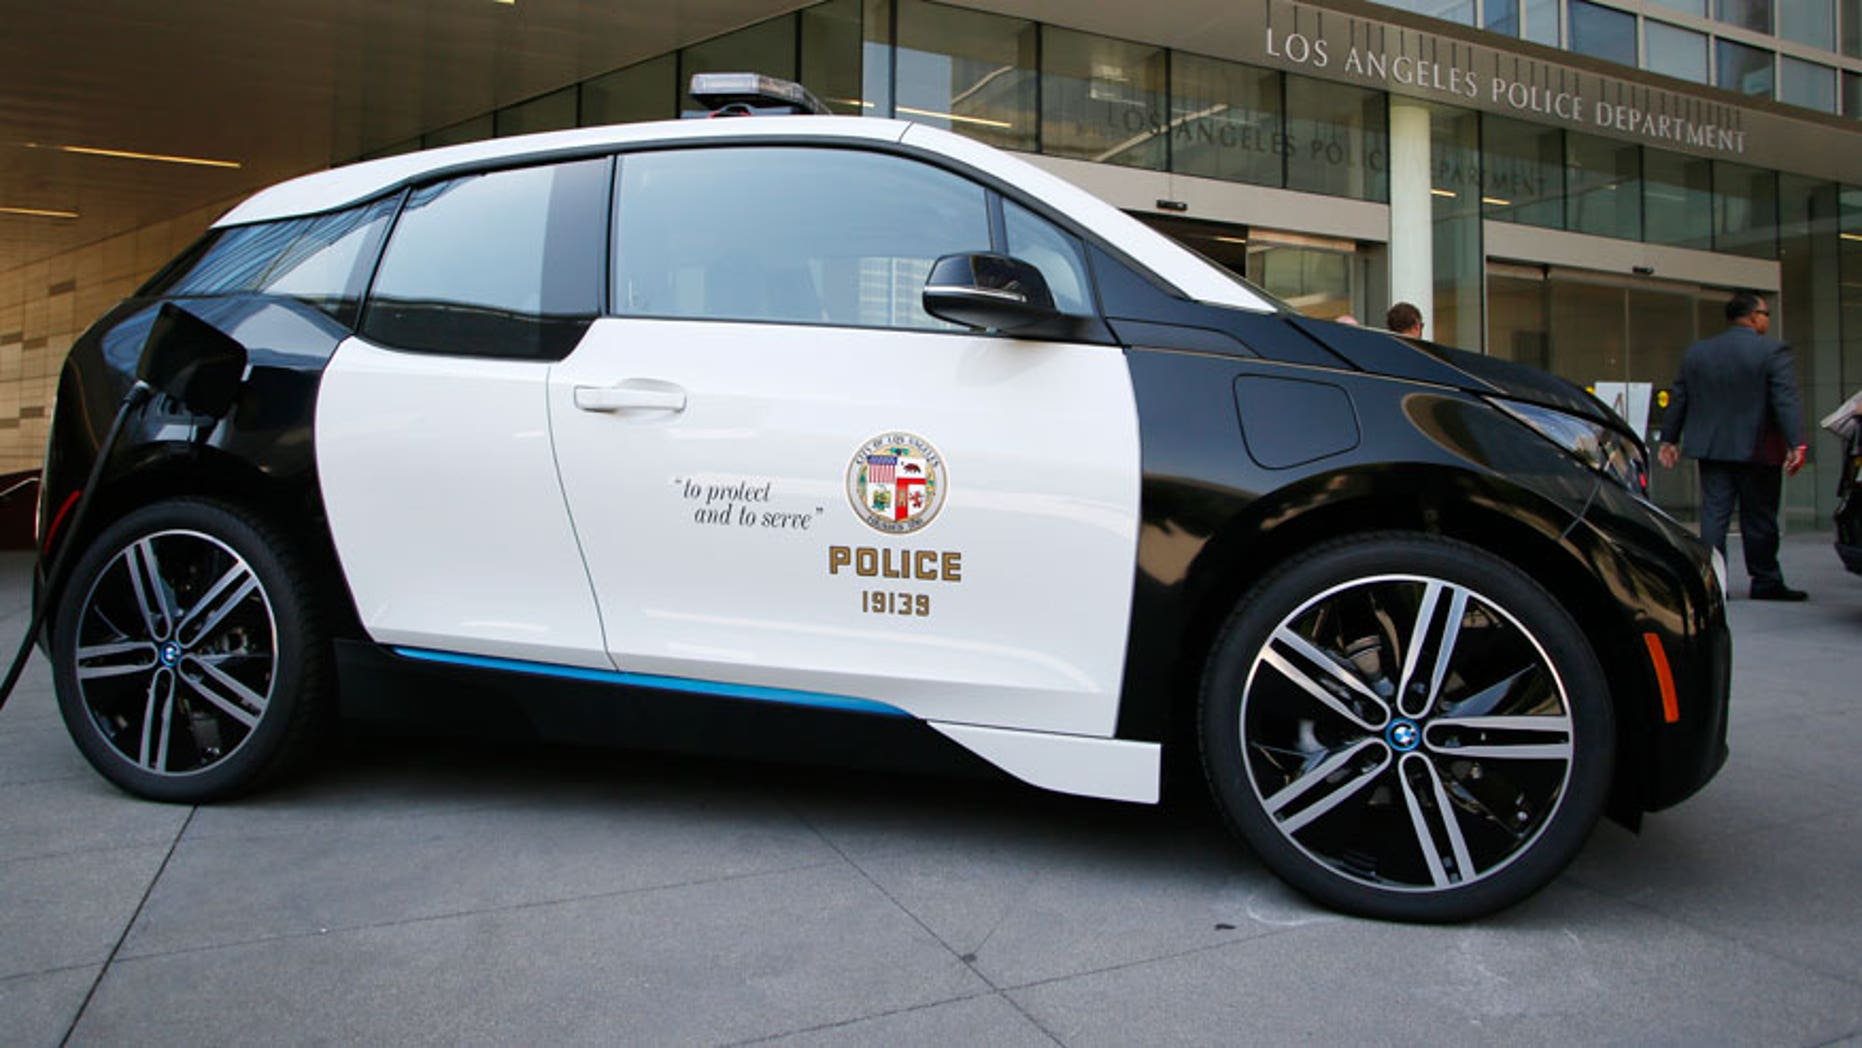 Lapd Elisting 100 Bmw I3 Electric Cars Fox News